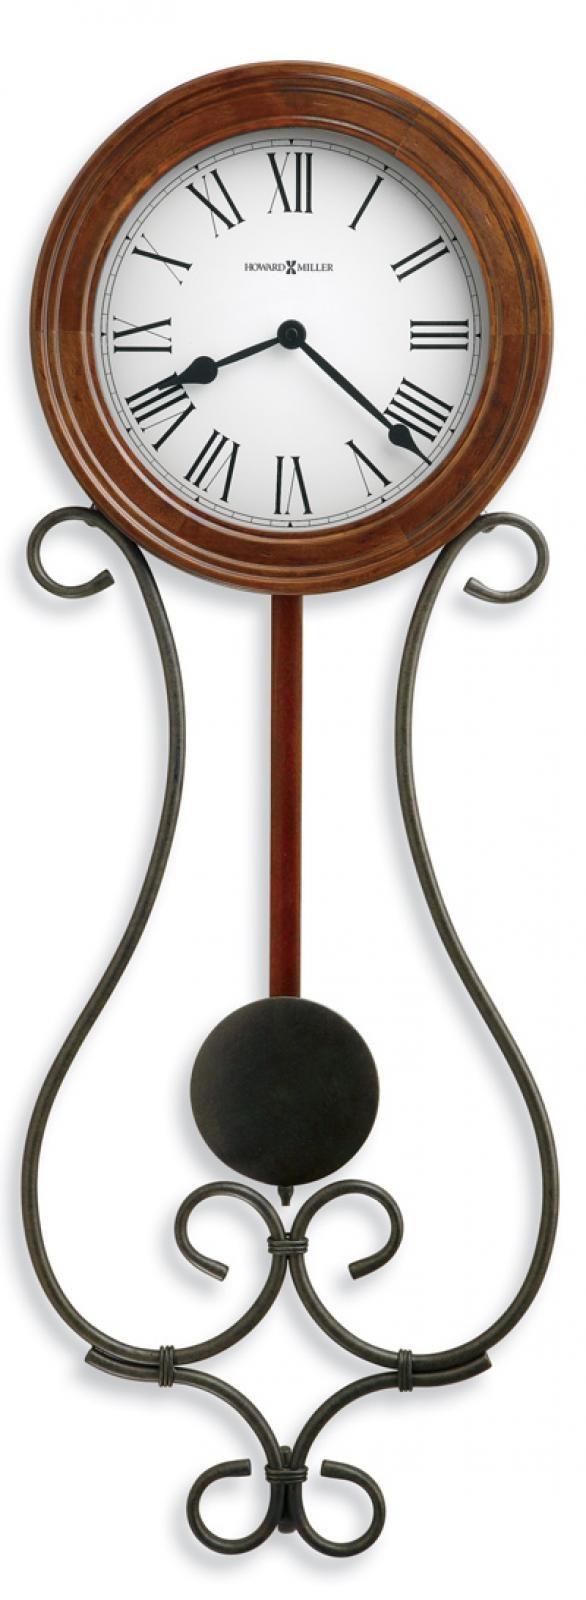 25 melhores ideias de howard miller wall clock no pinterest howard miller wall clock amipublicfo Gallery